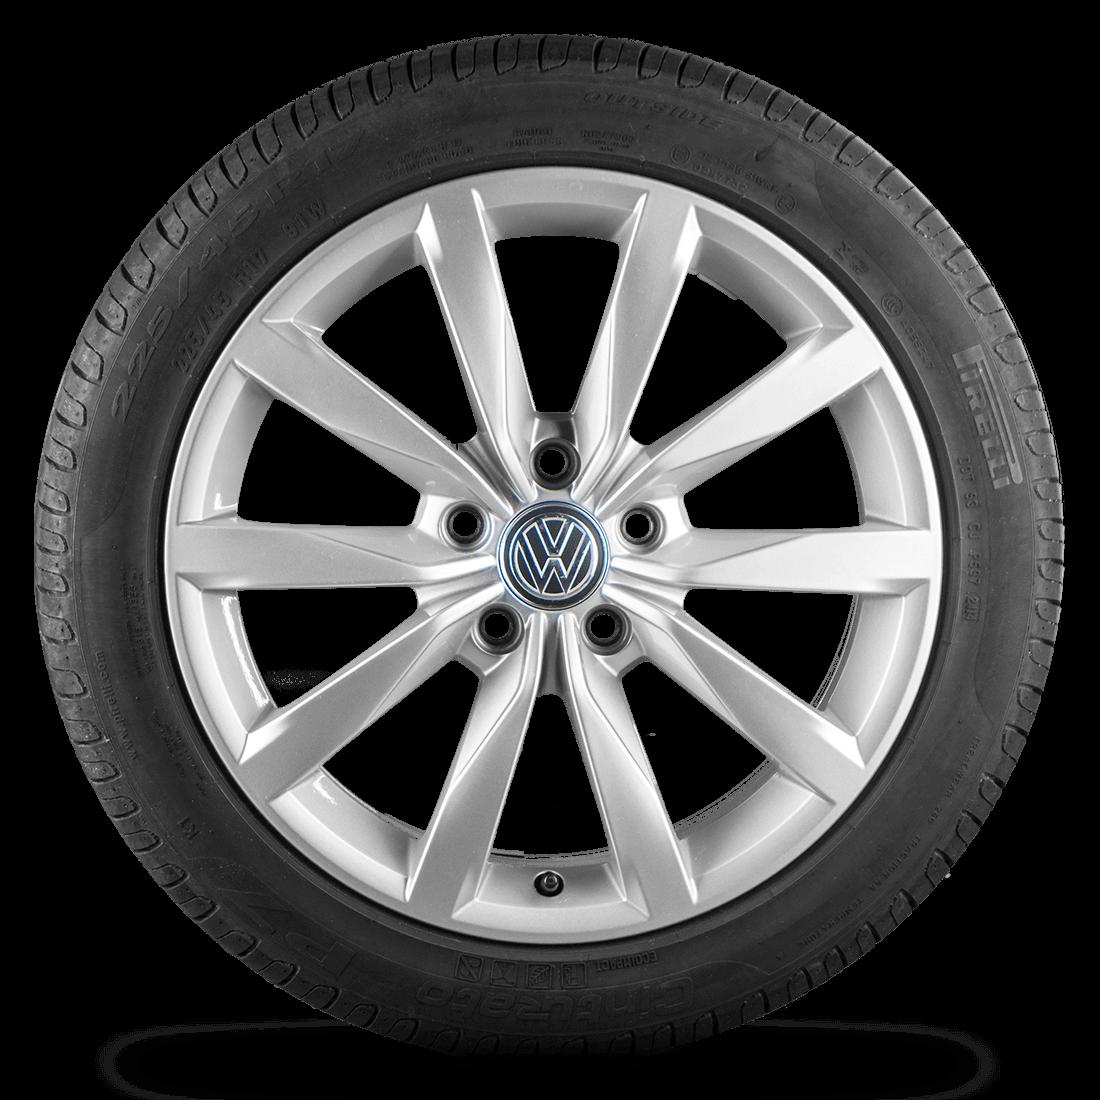 VW Golf 5 6 7 VI VII 5G Felgen Alufelgen Sommerreifen 5G0601025BH R line Dijon